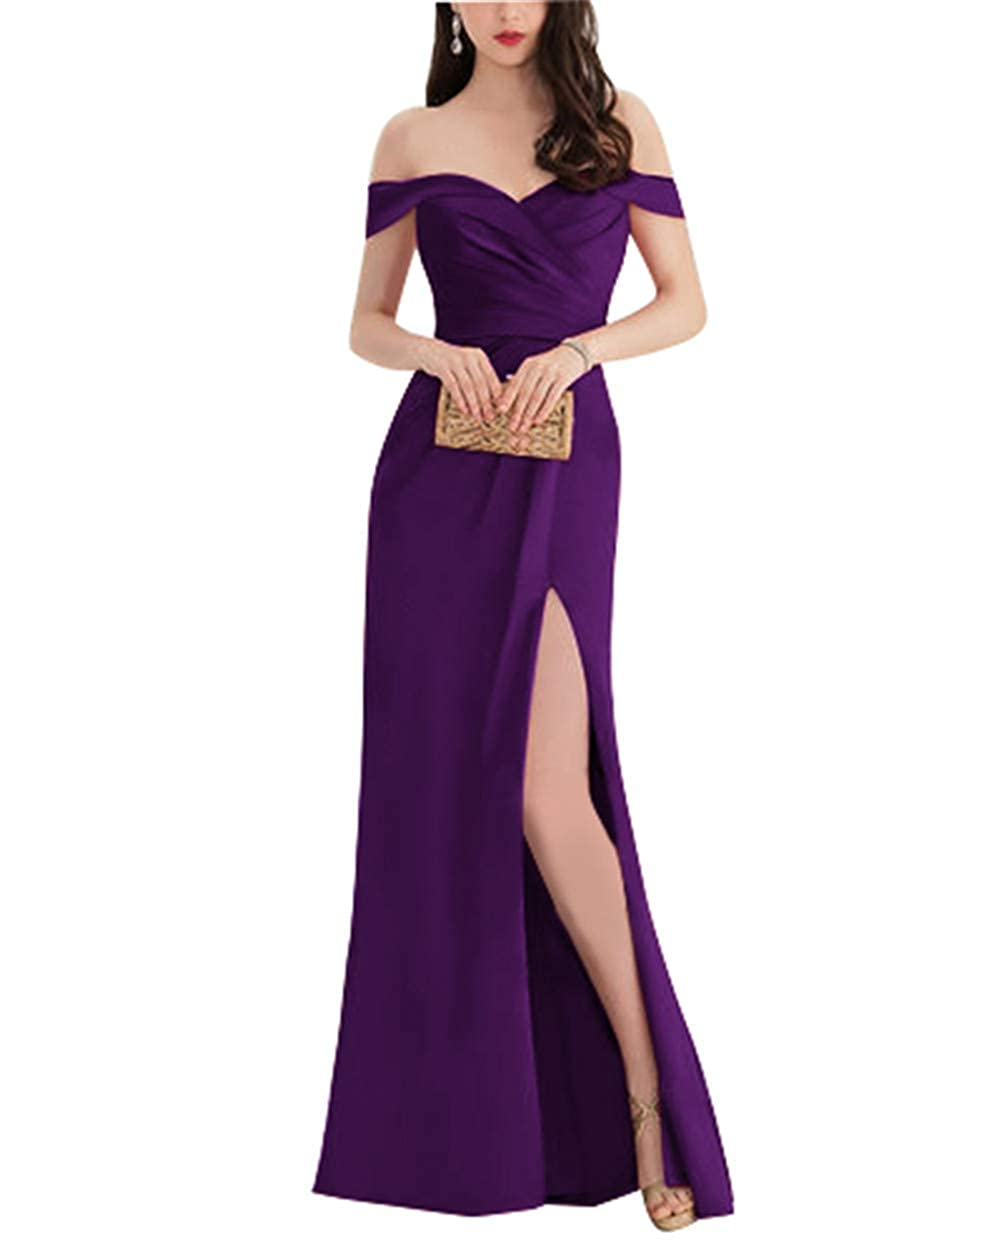 Grape Homecy Split Off Shoulder Prom Dress for Women Mermaid Long Satin Formal Evening Gowns